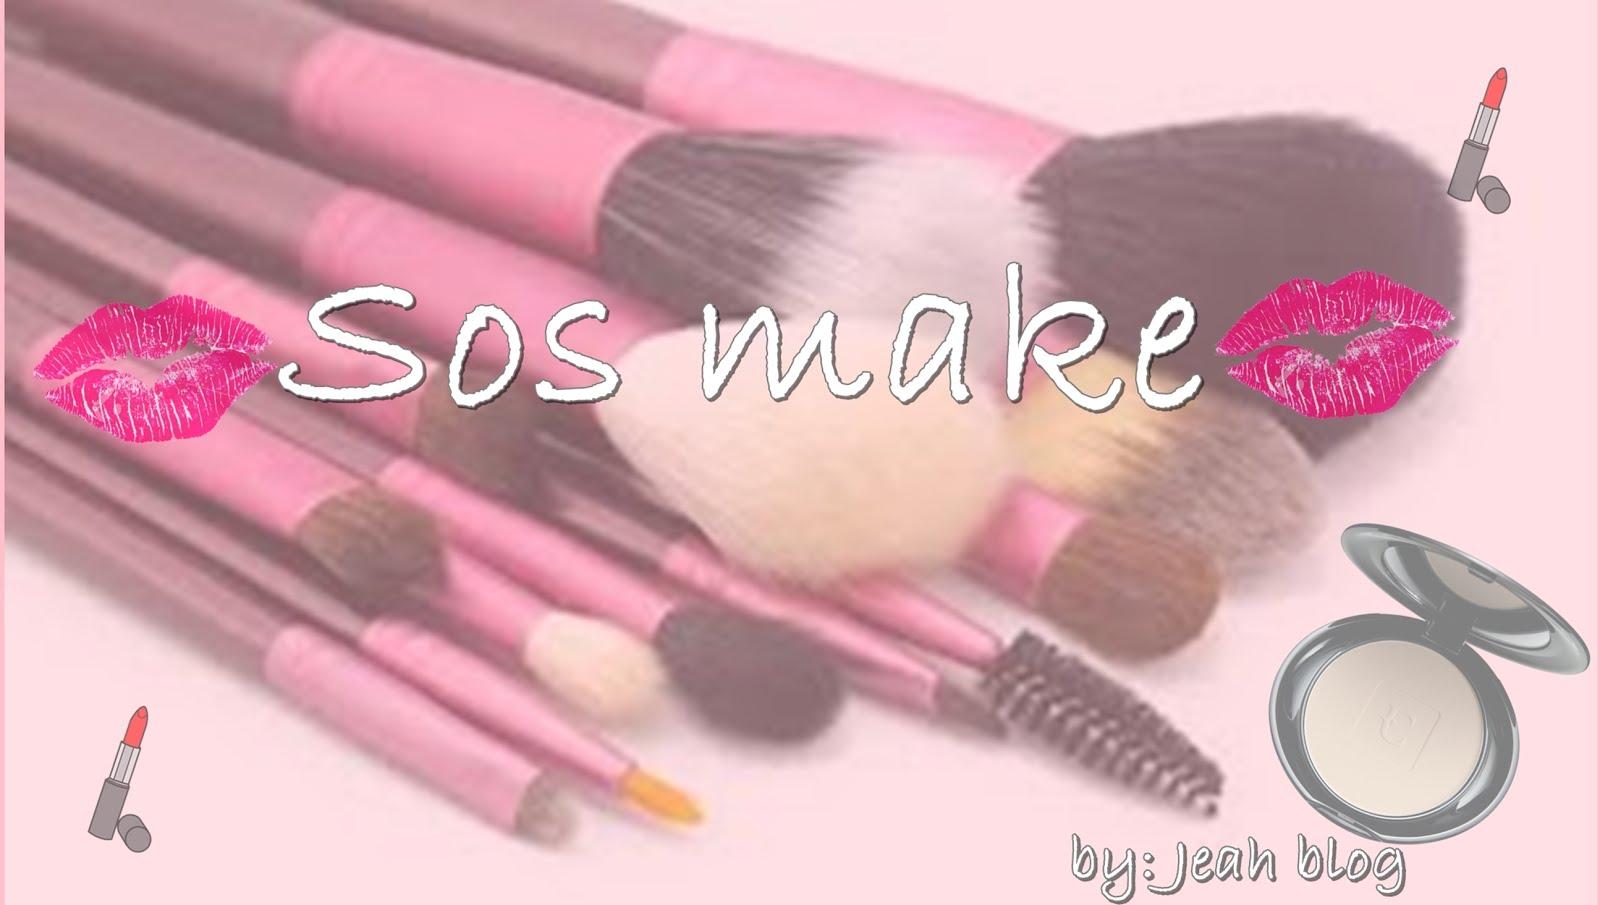 Sos make